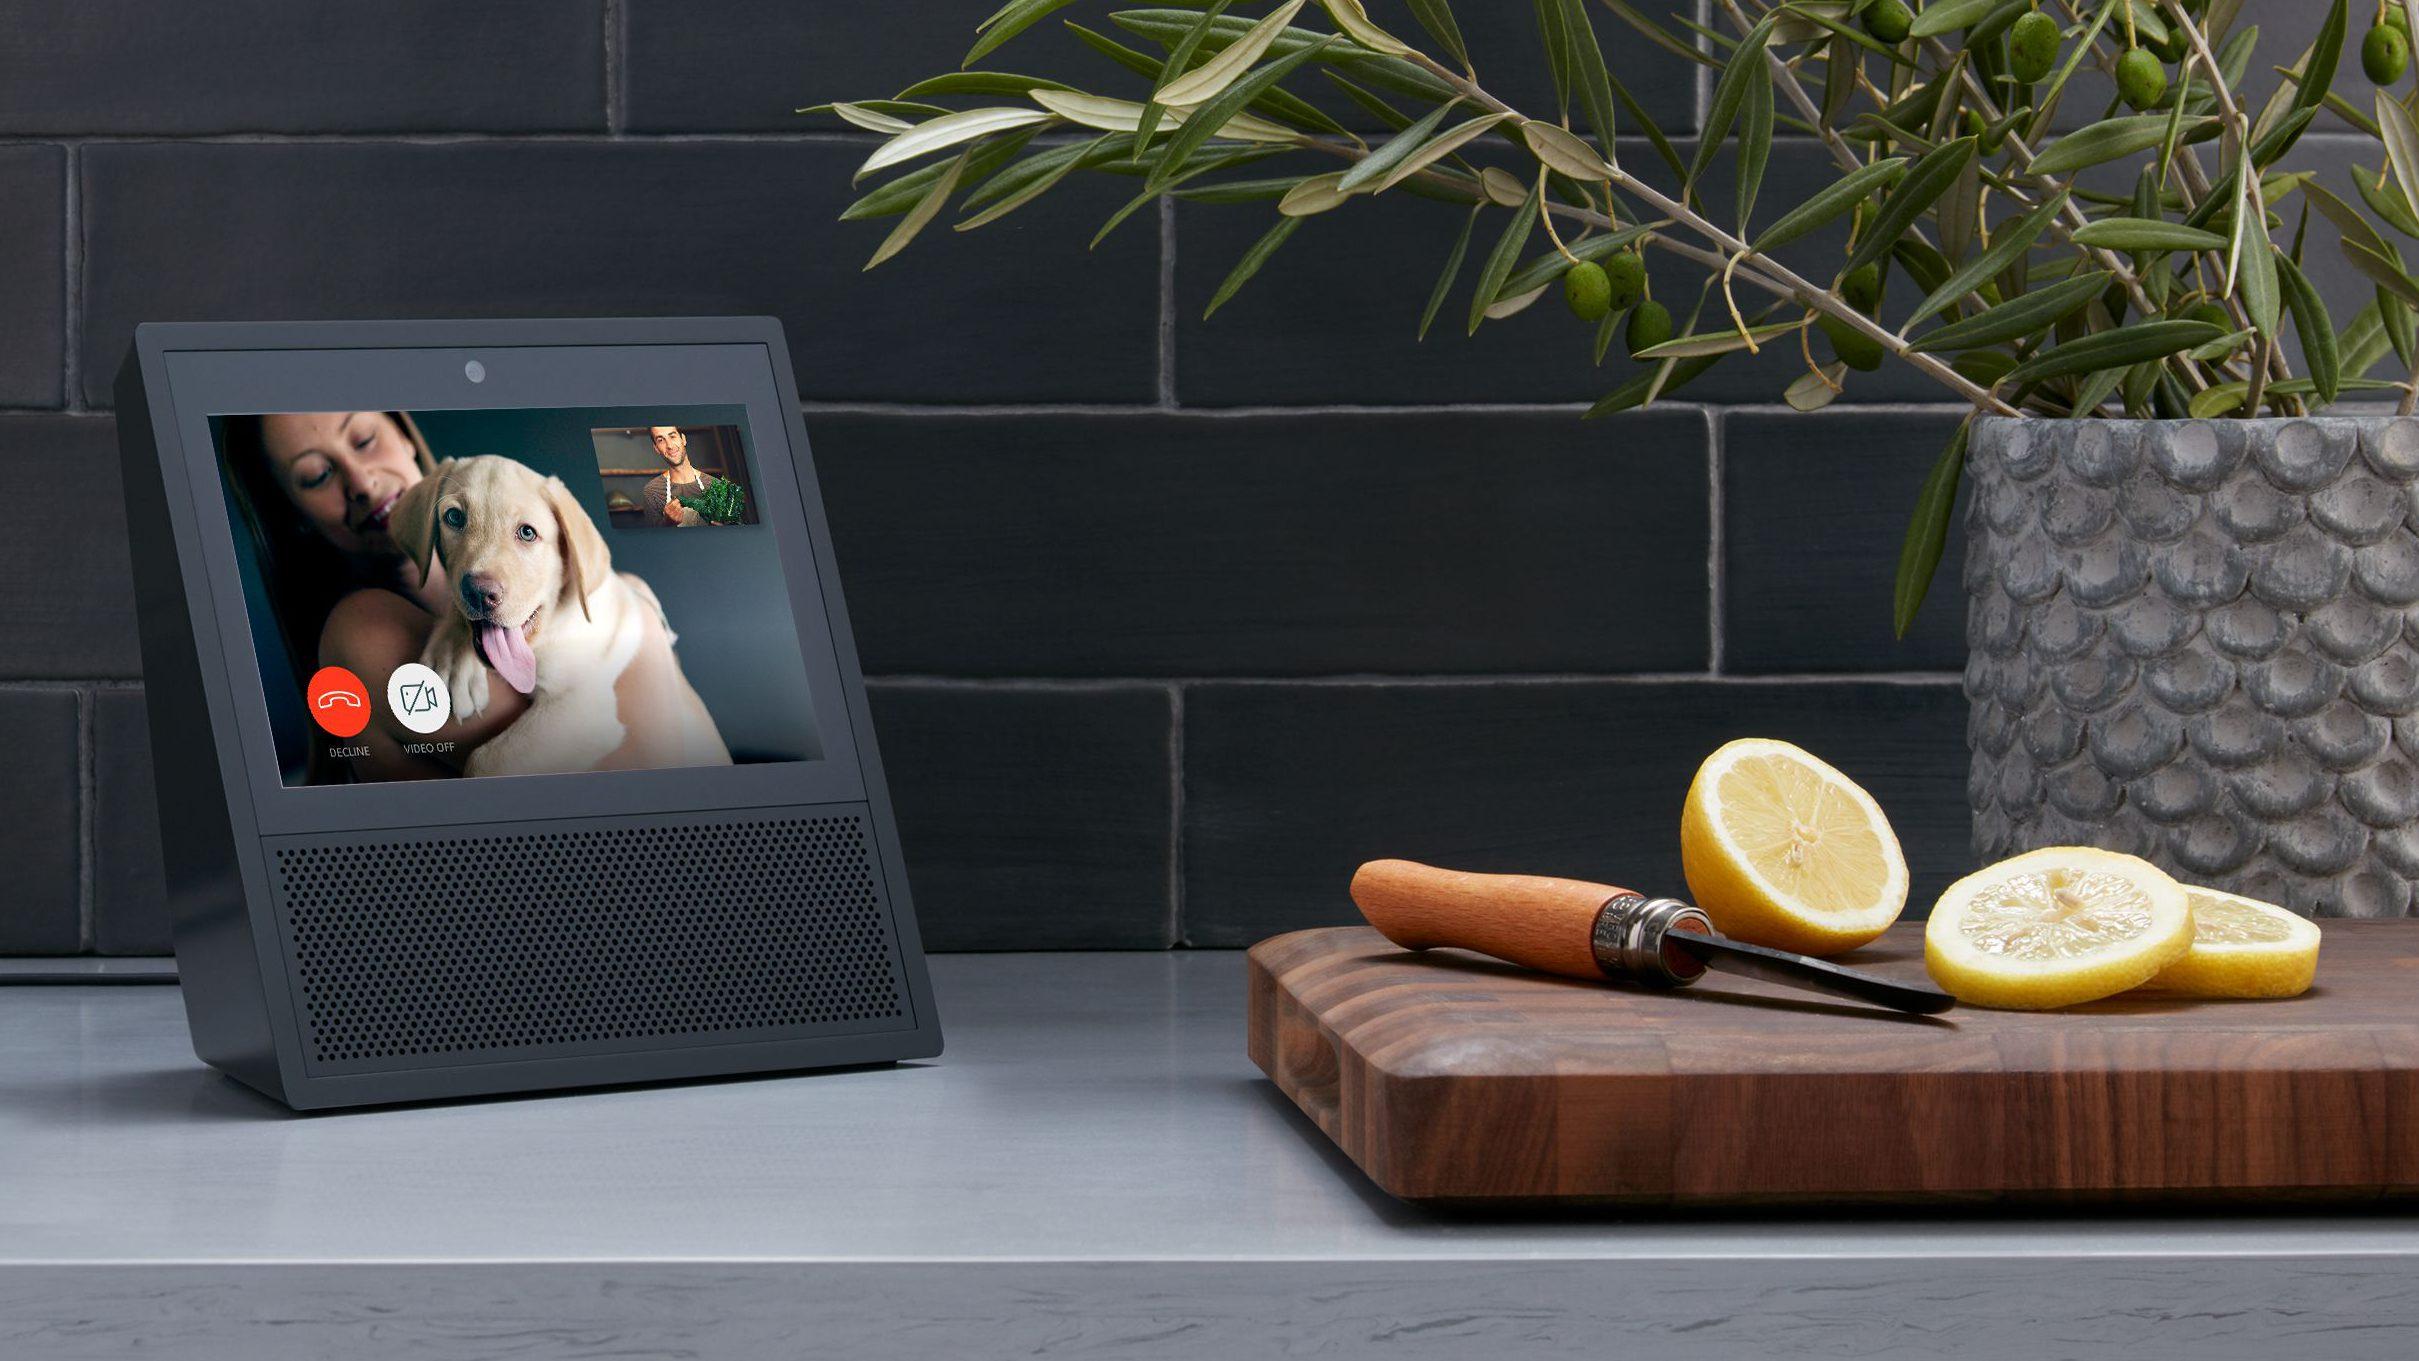 Amazon Echo Show, Black, Counter